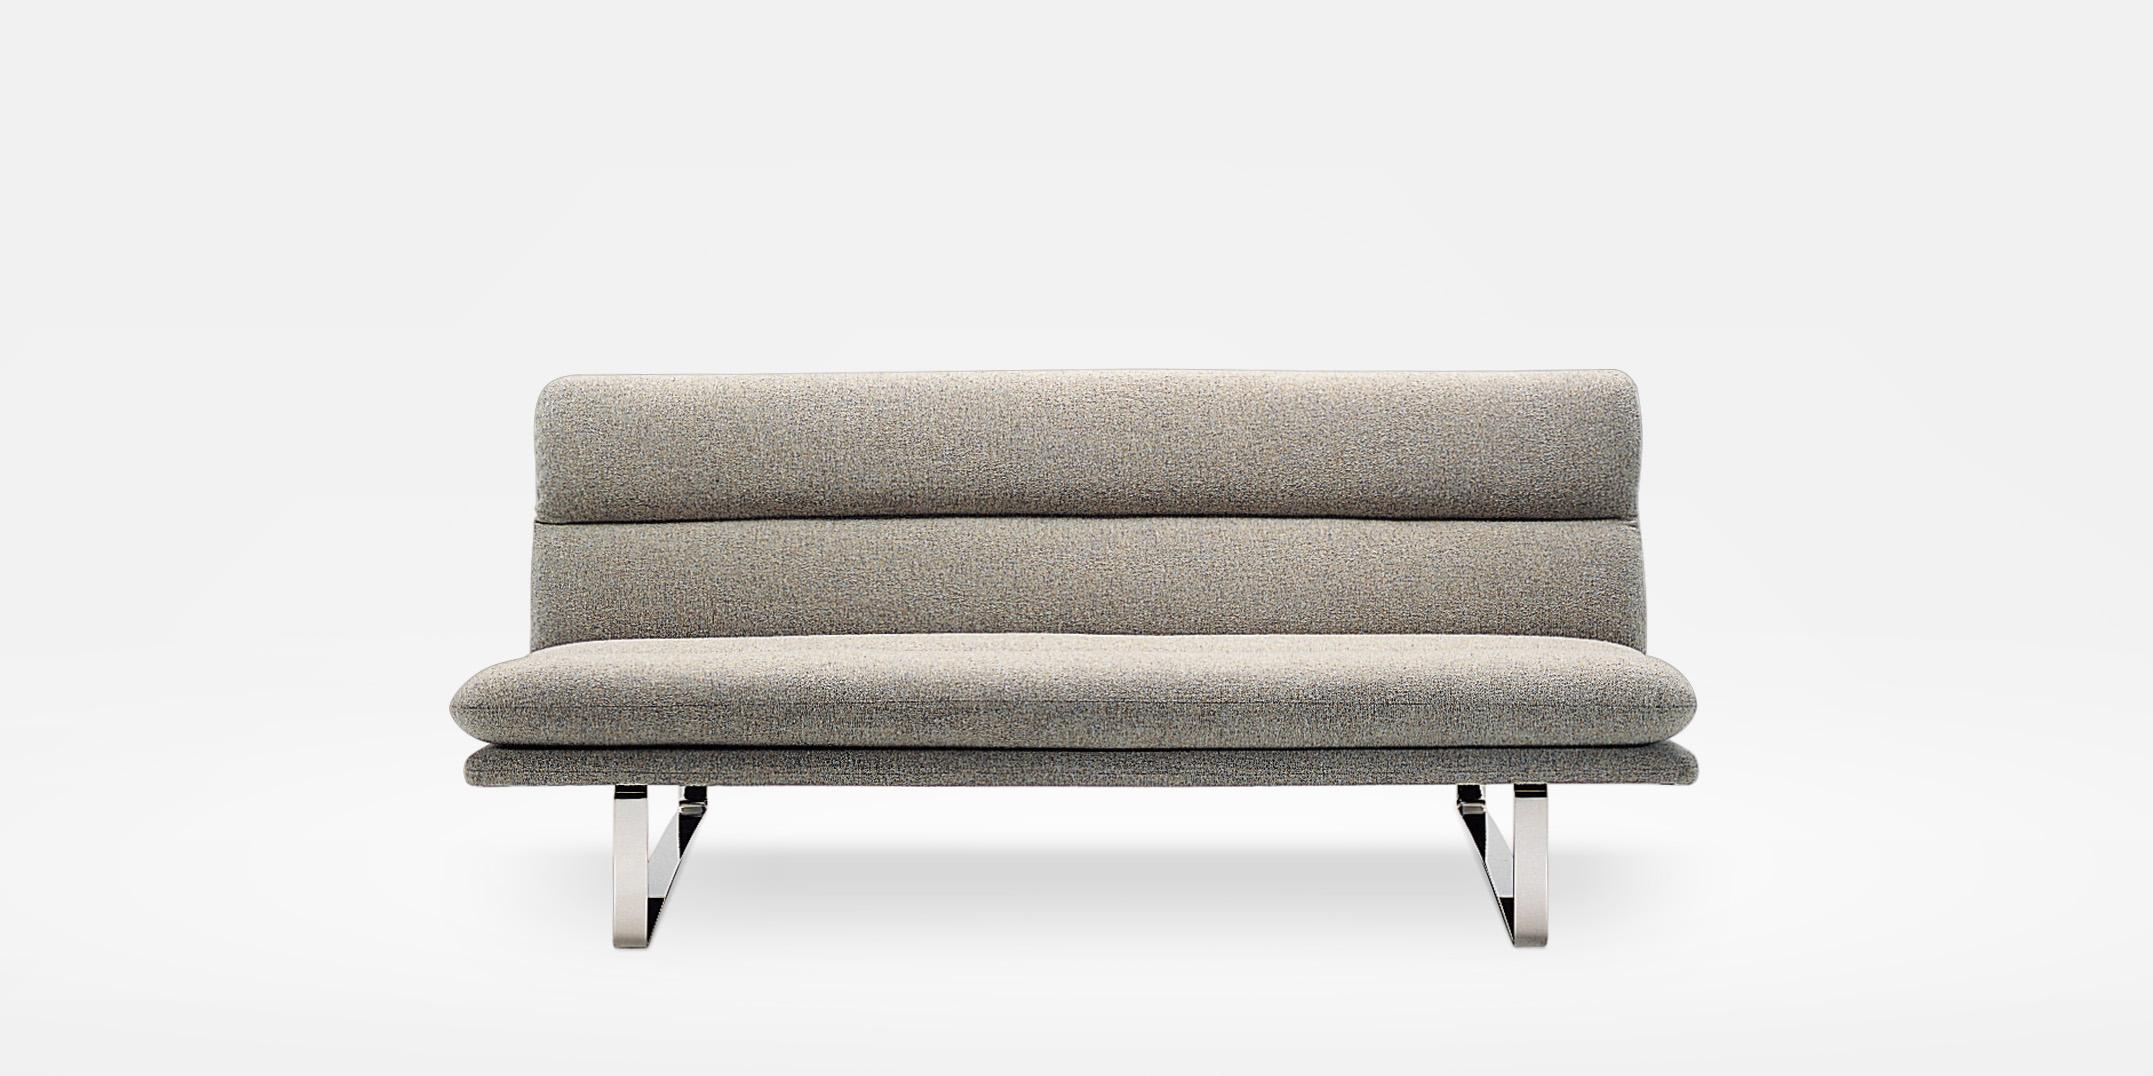 kleine sofas fr kleine rume awesome awesome full size of tisch sofa tische sthle marktex. Black Bedroom Furniture Sets. Home Design Ideas